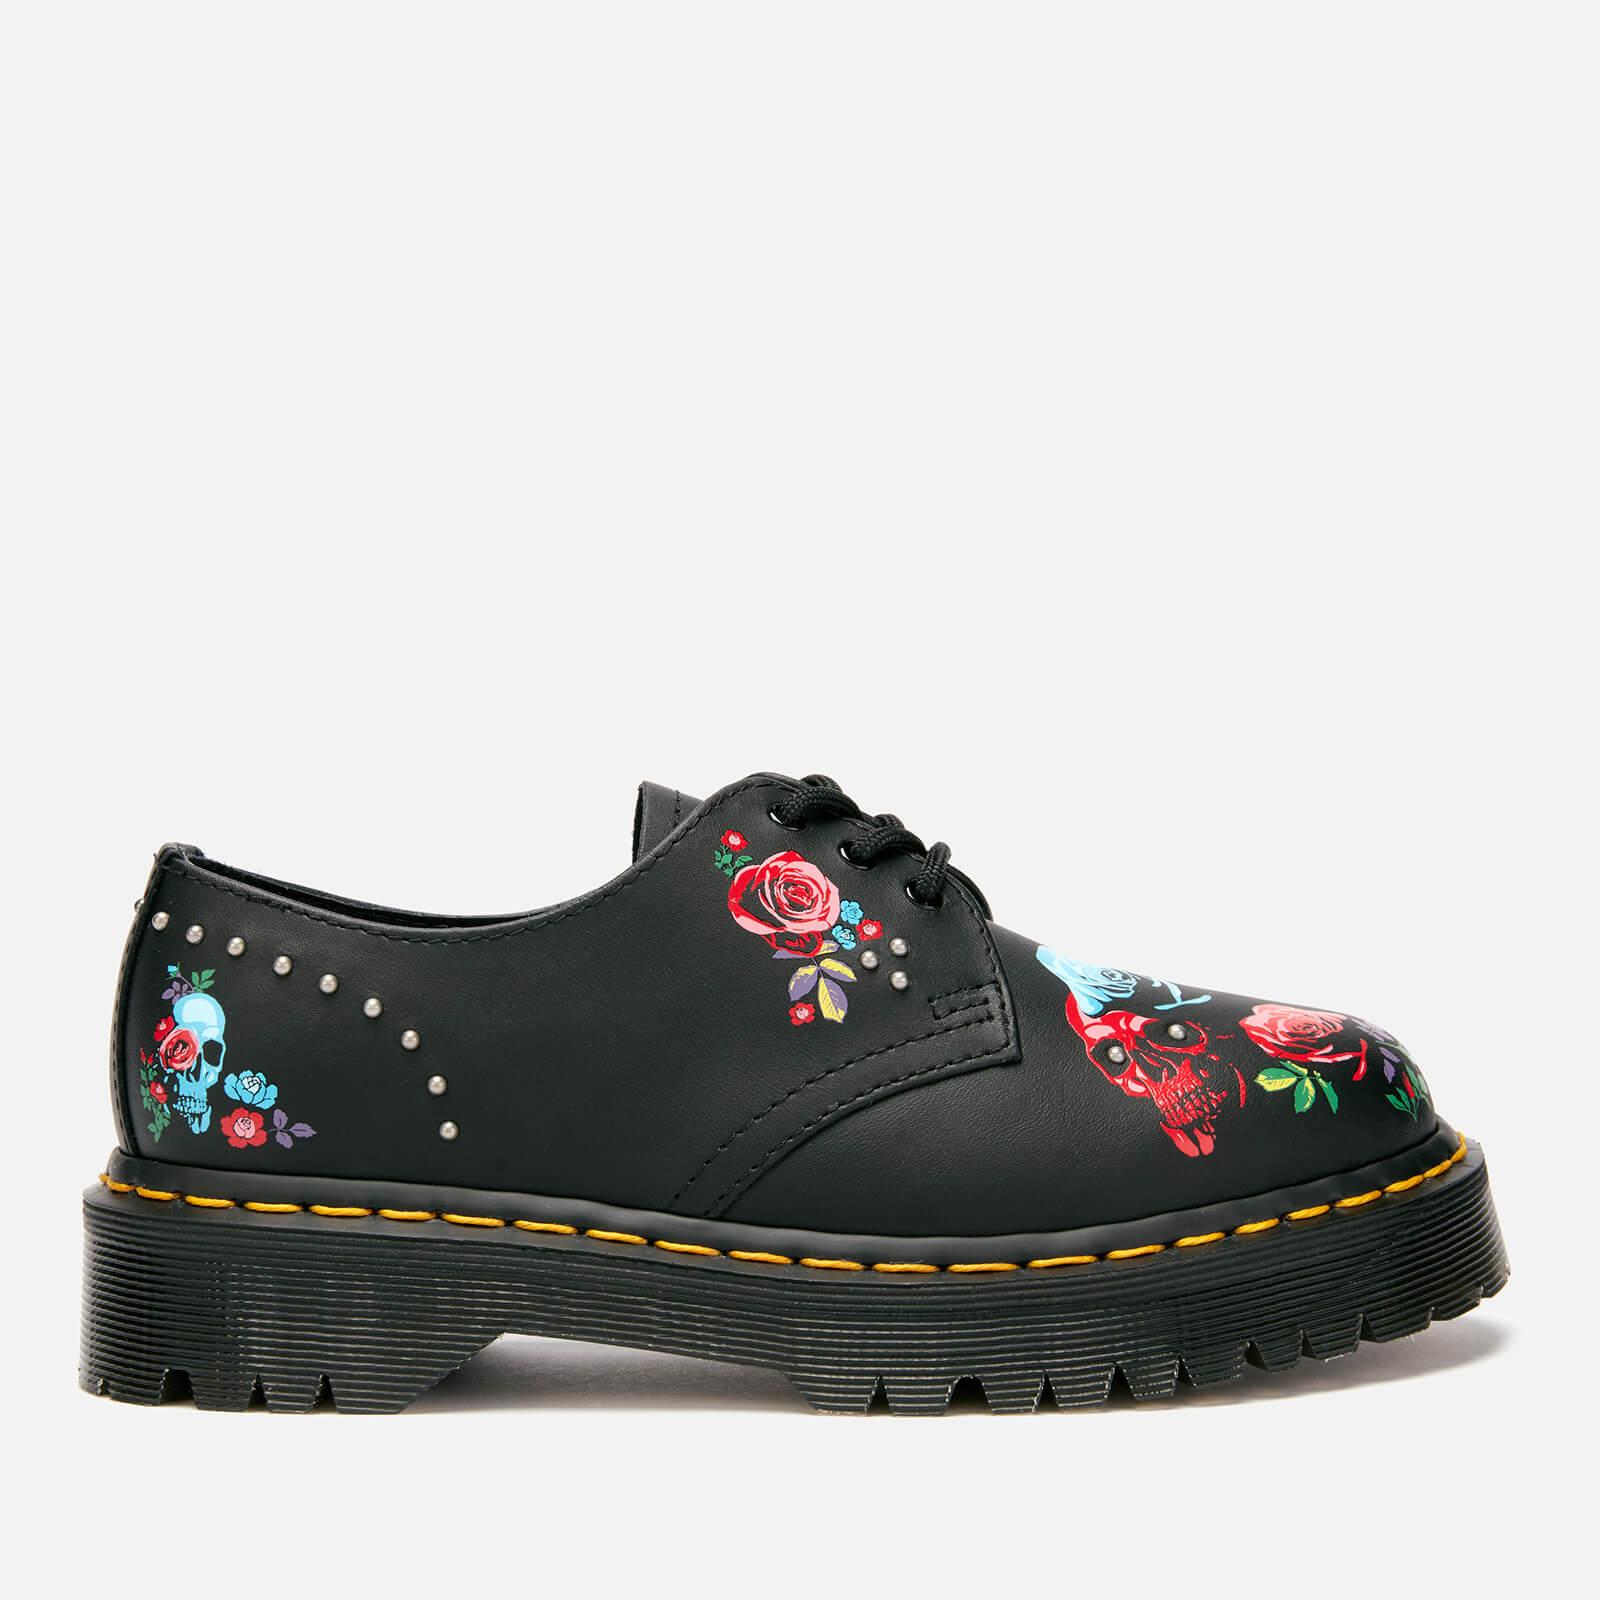 Dr. Martens Women's 1461 Bex Rode 3-Eye Shoes - Rose Fantasy Placement - UK 5 - Black